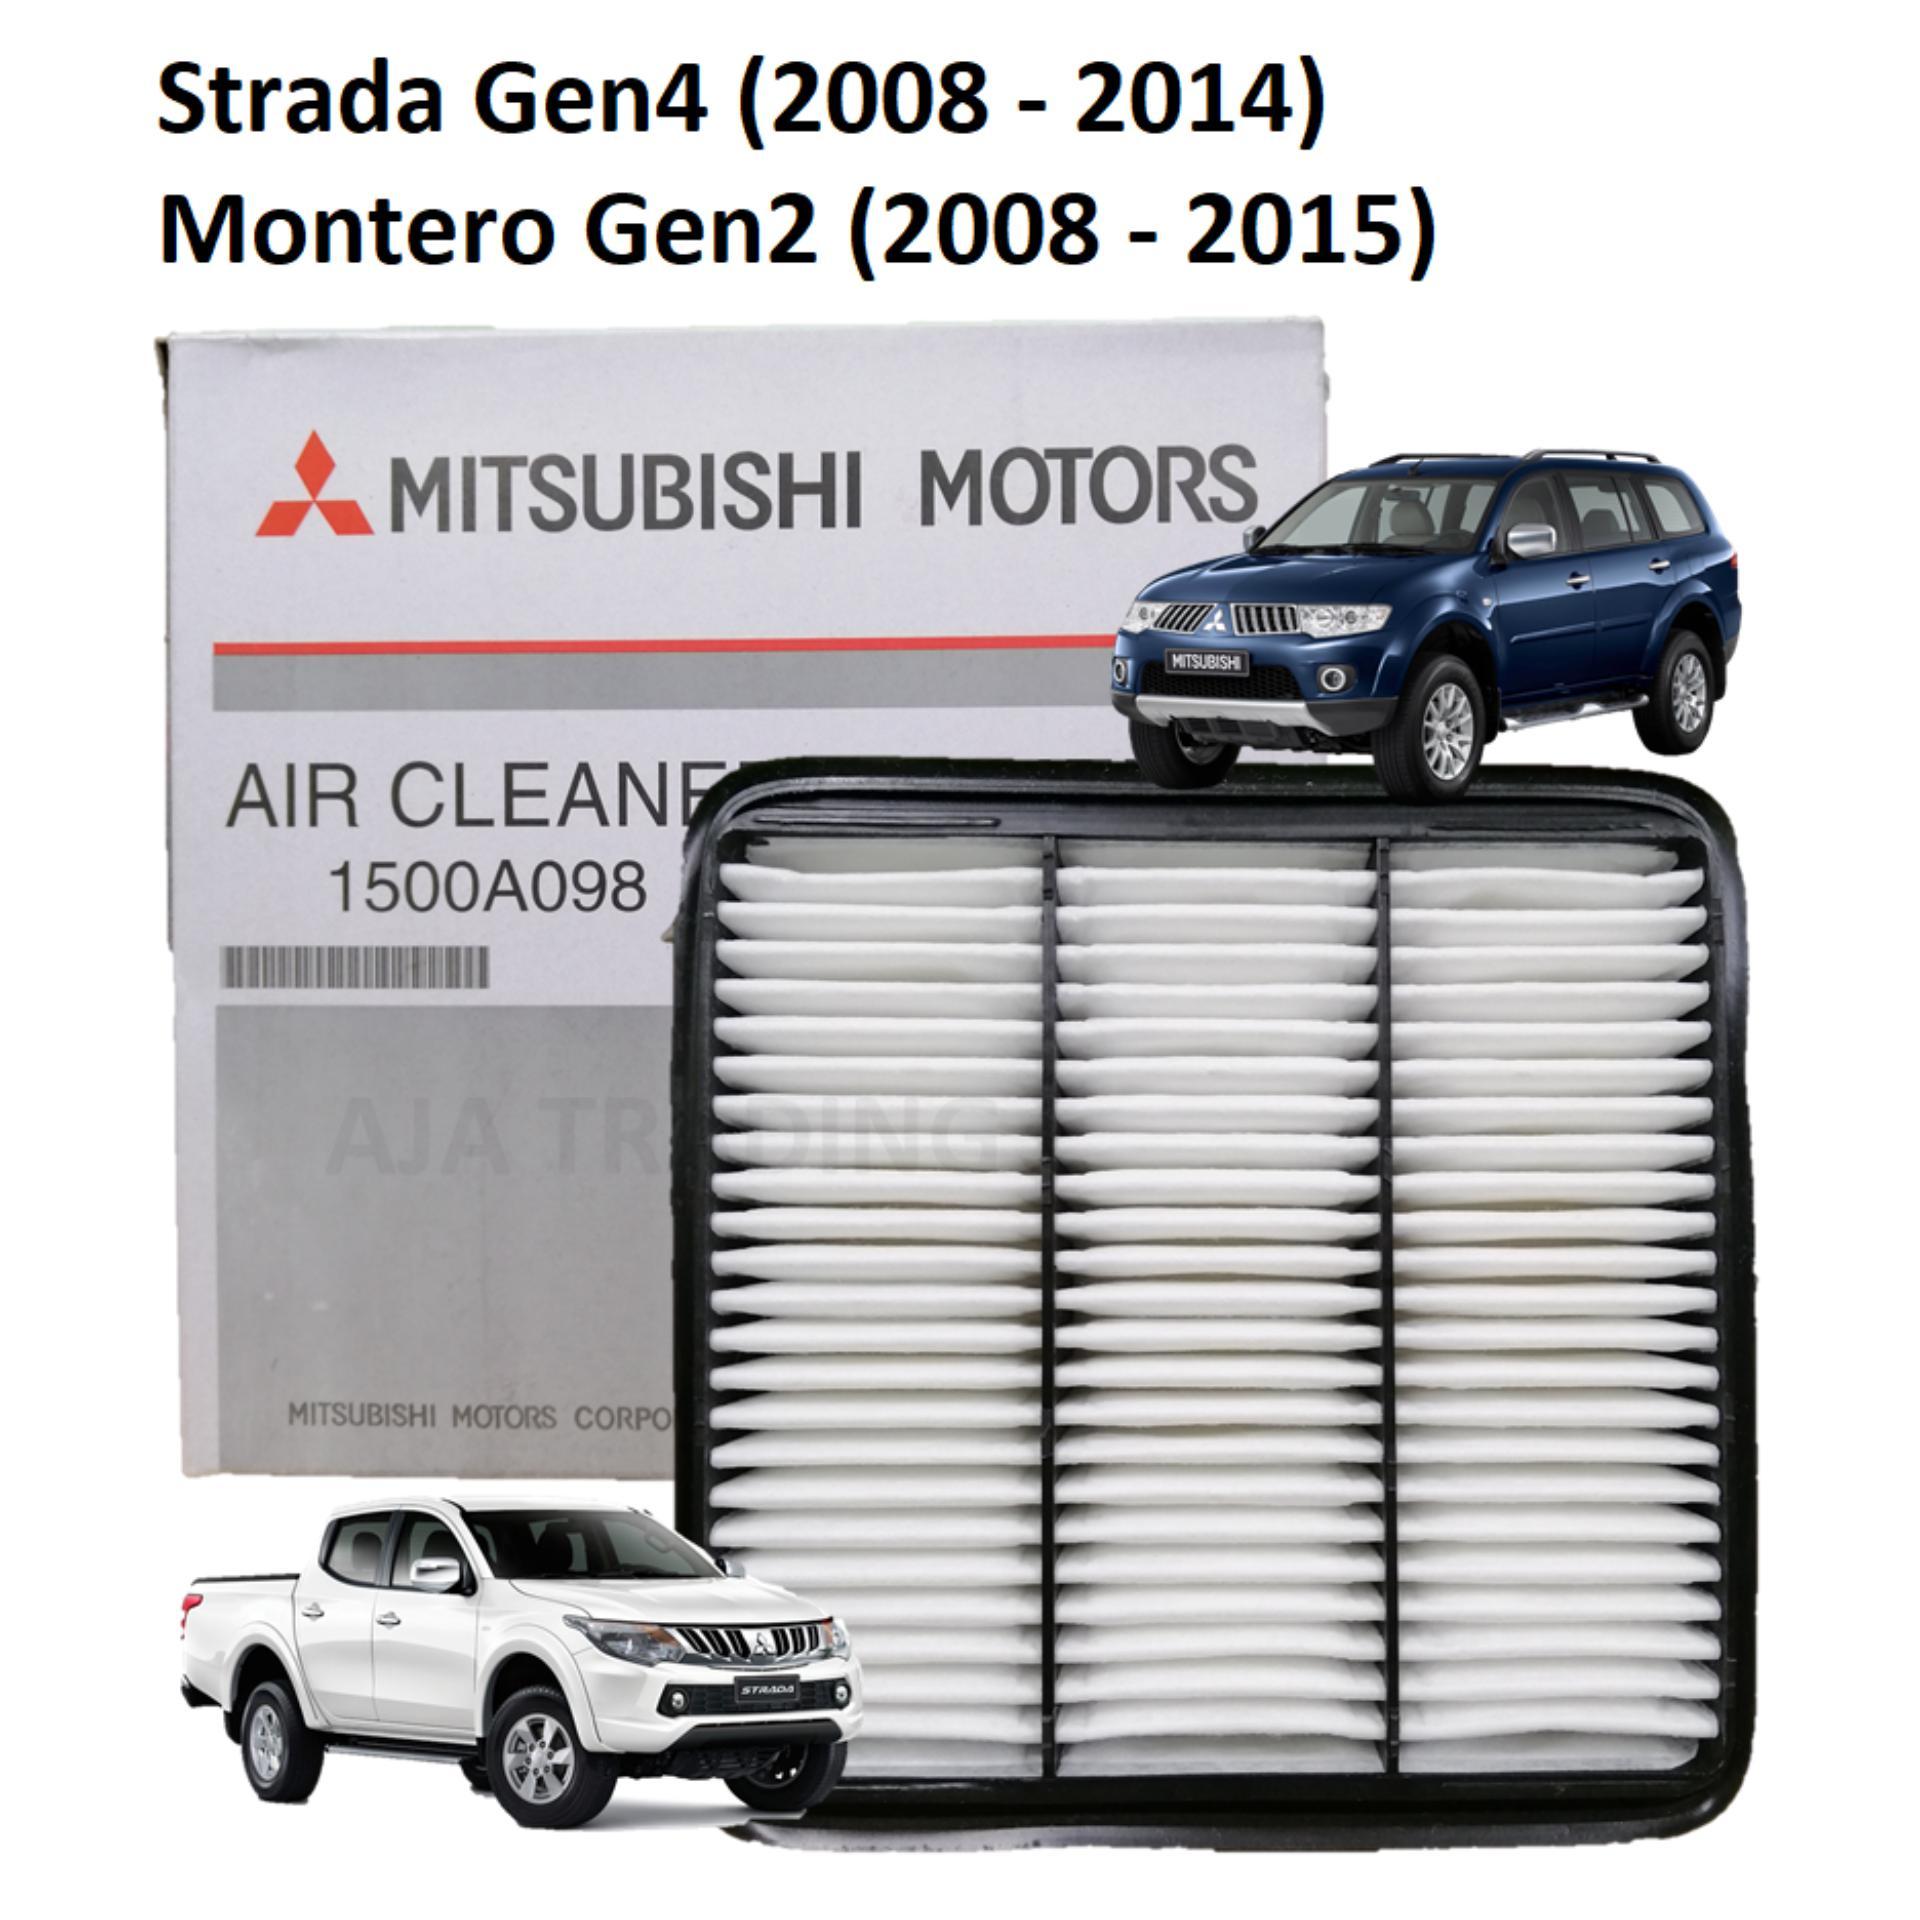 Air Filter for Mitsubishi Strada and Montero Gen2 (2008 - 2015)